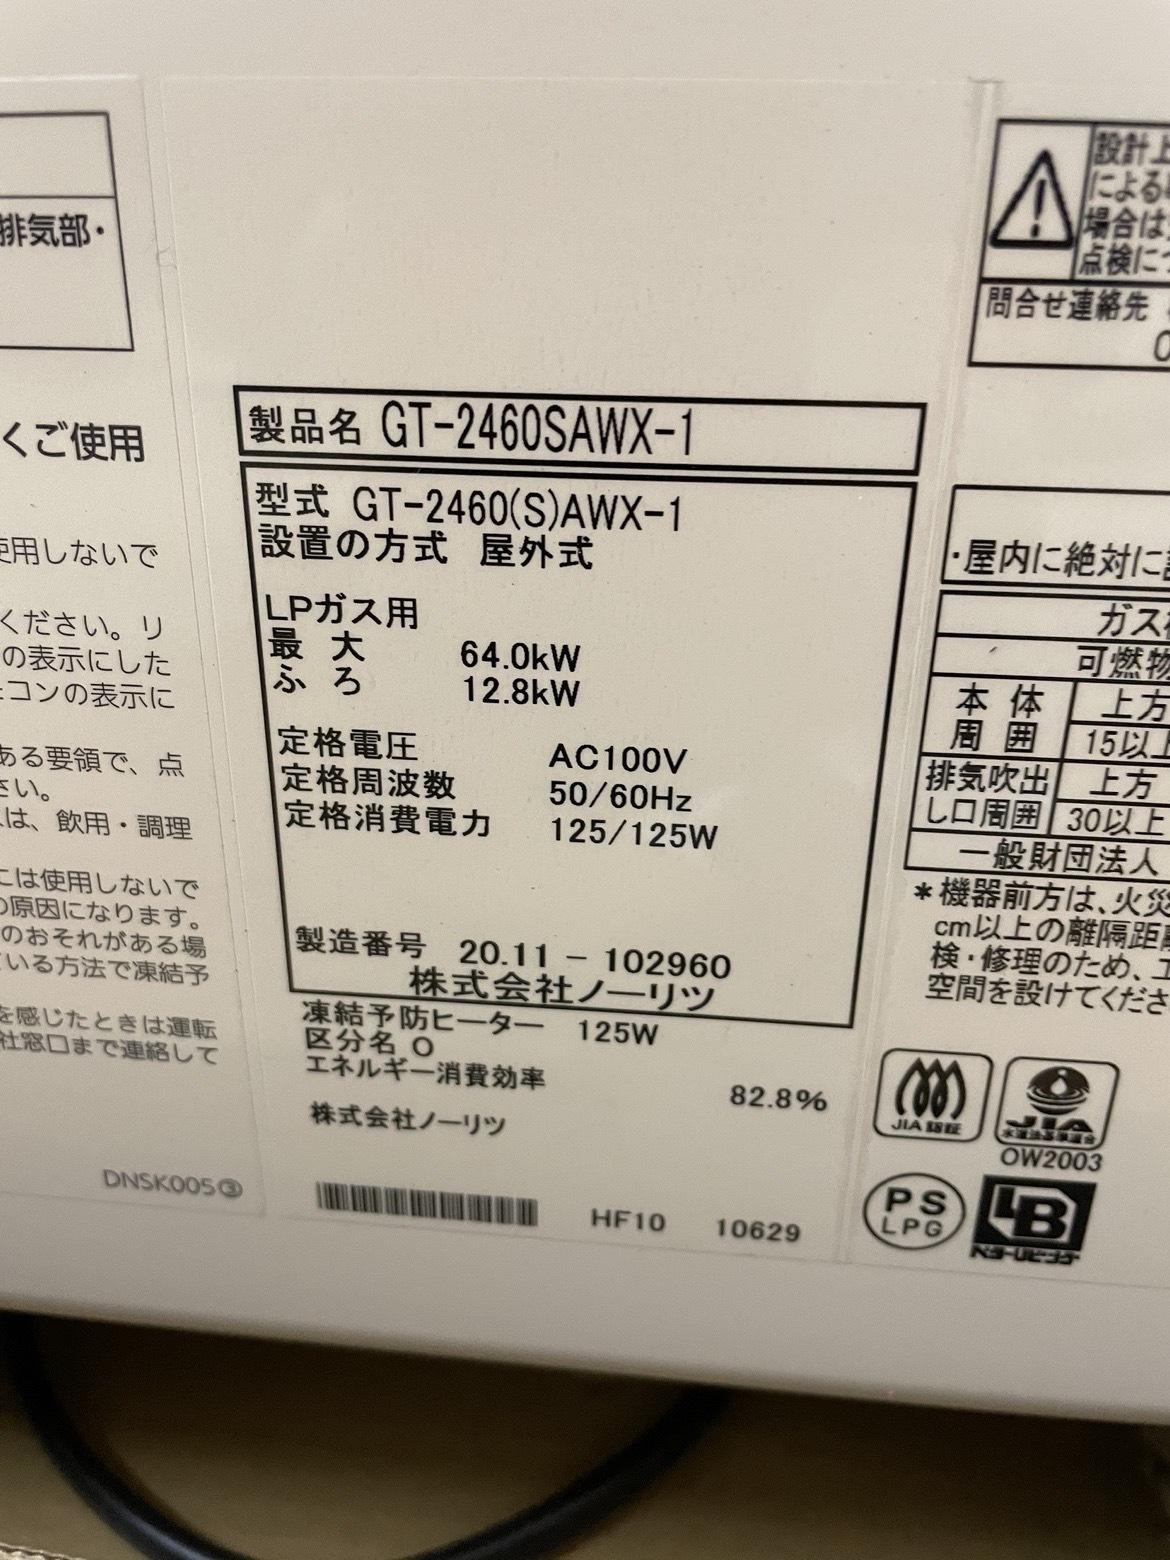 GT-2460SAWX-1 RC-B001 台所・浴室 リモコン